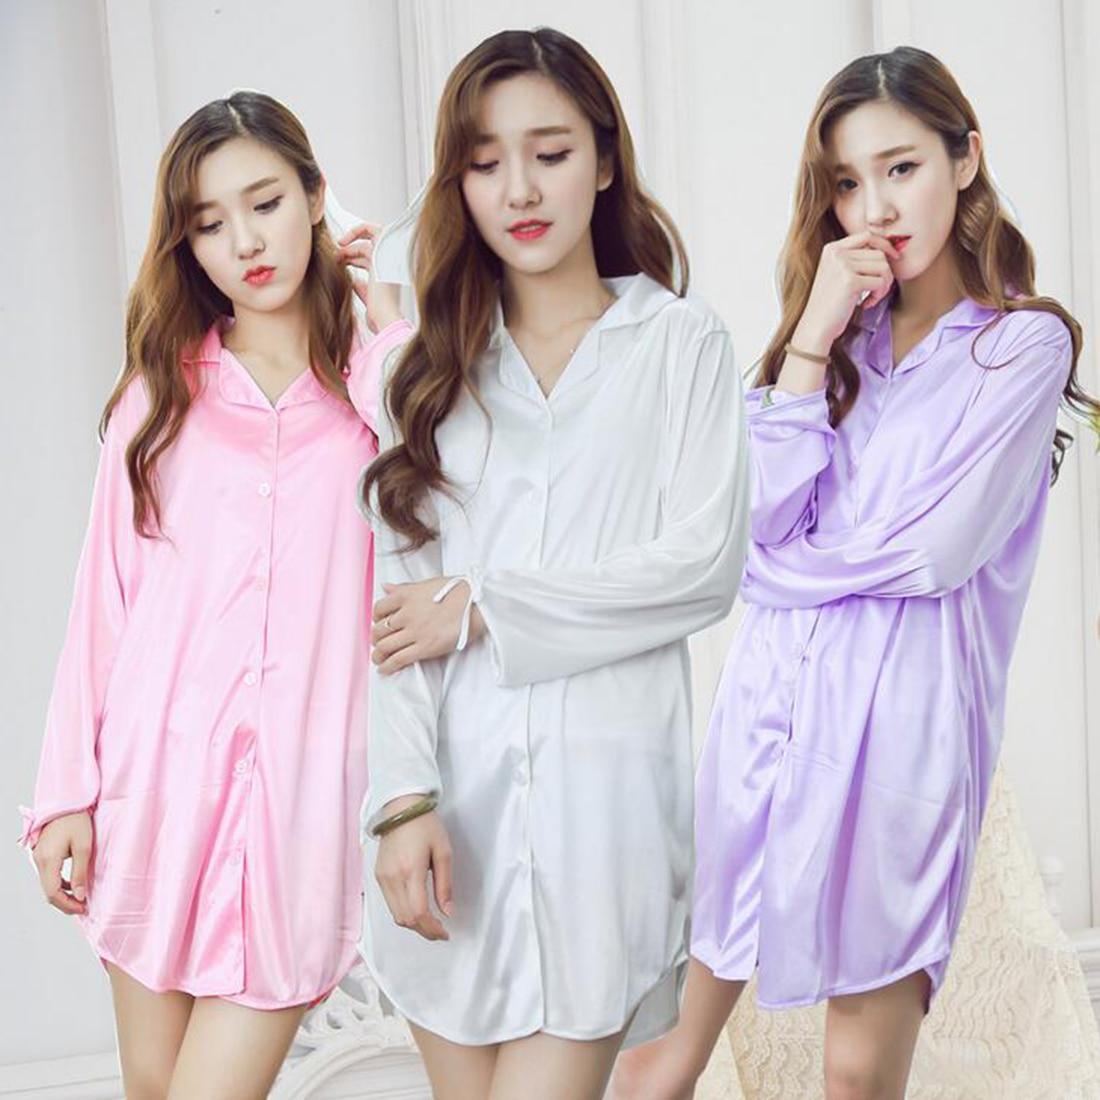 Ladies Plain Purple Satin Nightshirt Nightdress Short Sleeve Button Up PLUS SIZE